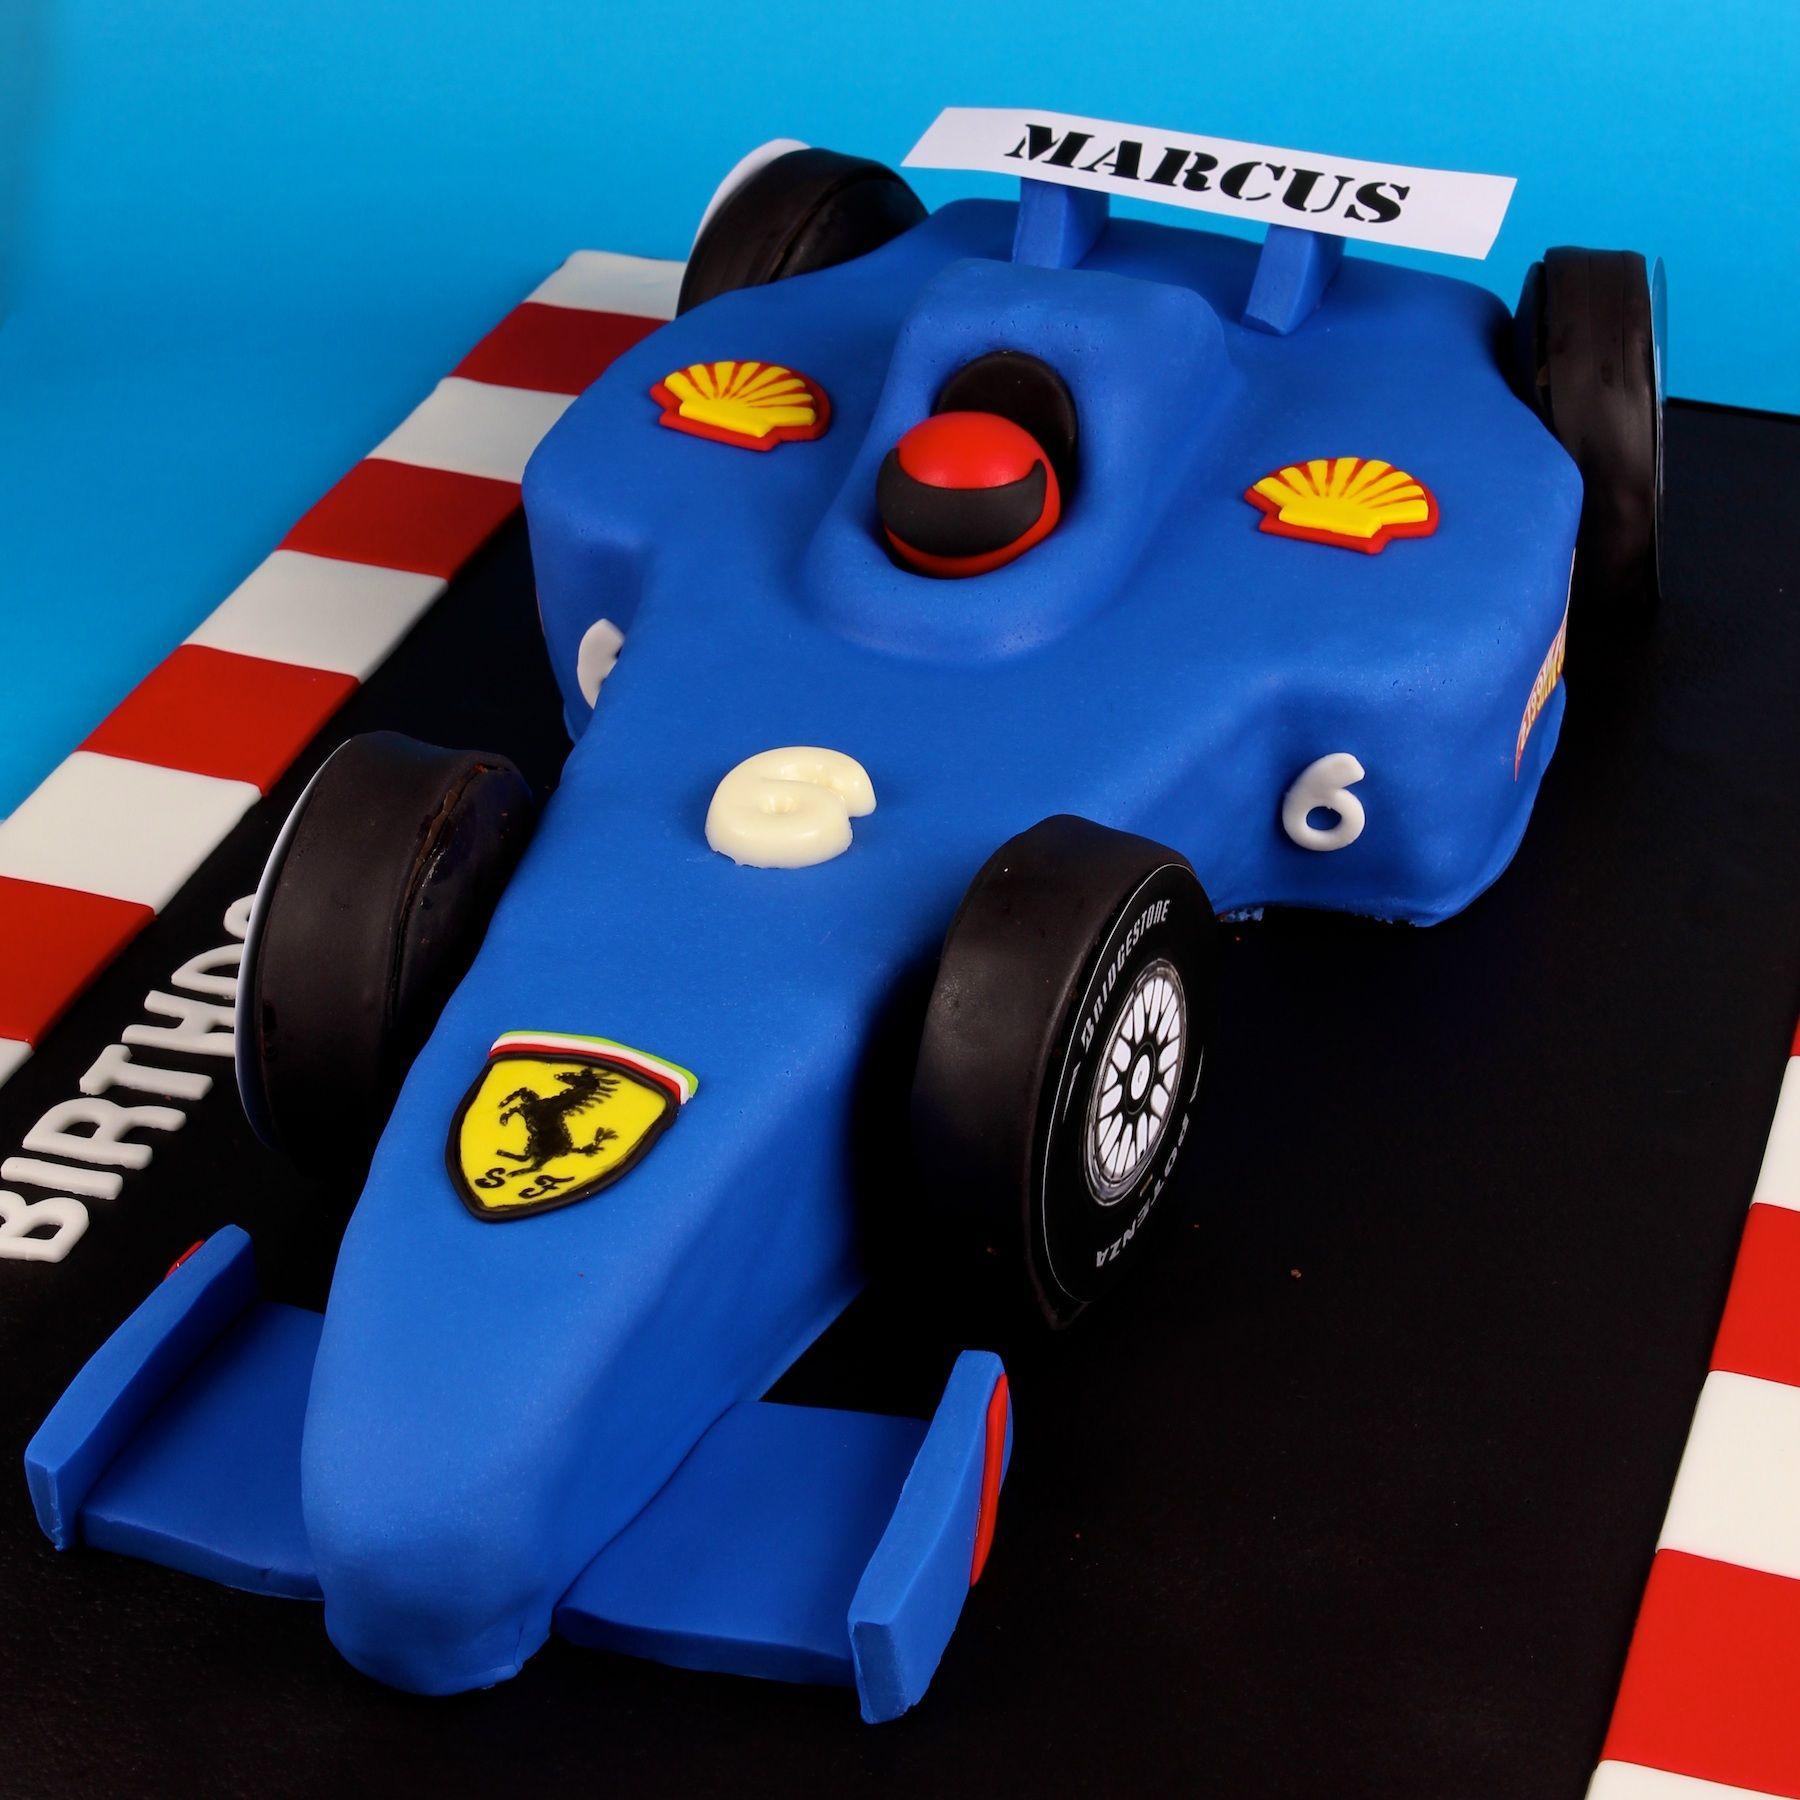 Race car cake formula 1 cake formula one cake cakes for F1 car cake template